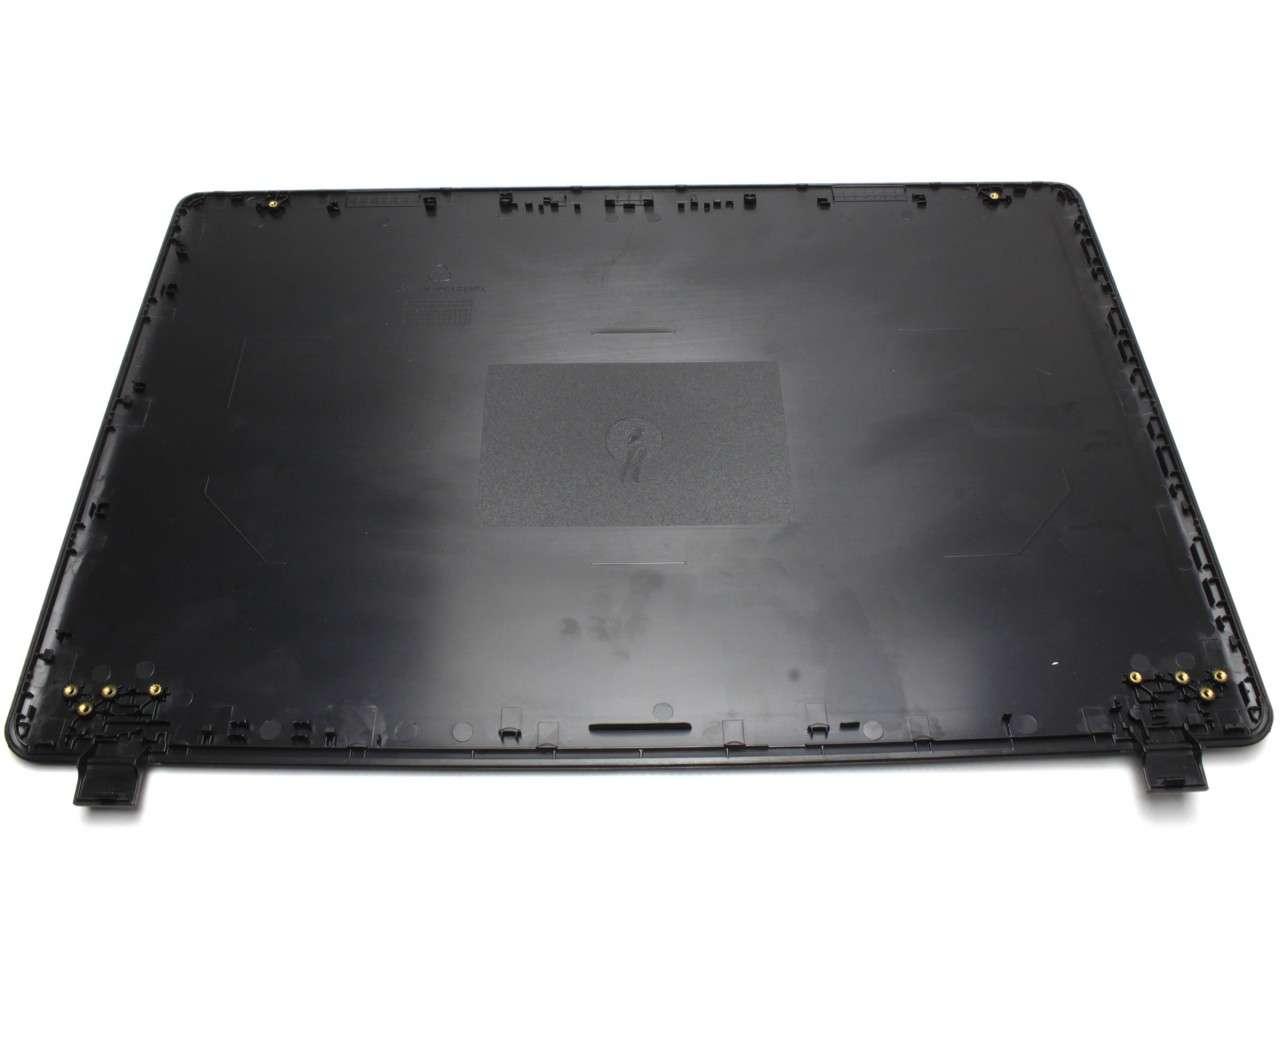 Capac Display BackCover Acer 60.GD0N2.002 Carcasa Display imagine powerlaptop.ro 2021